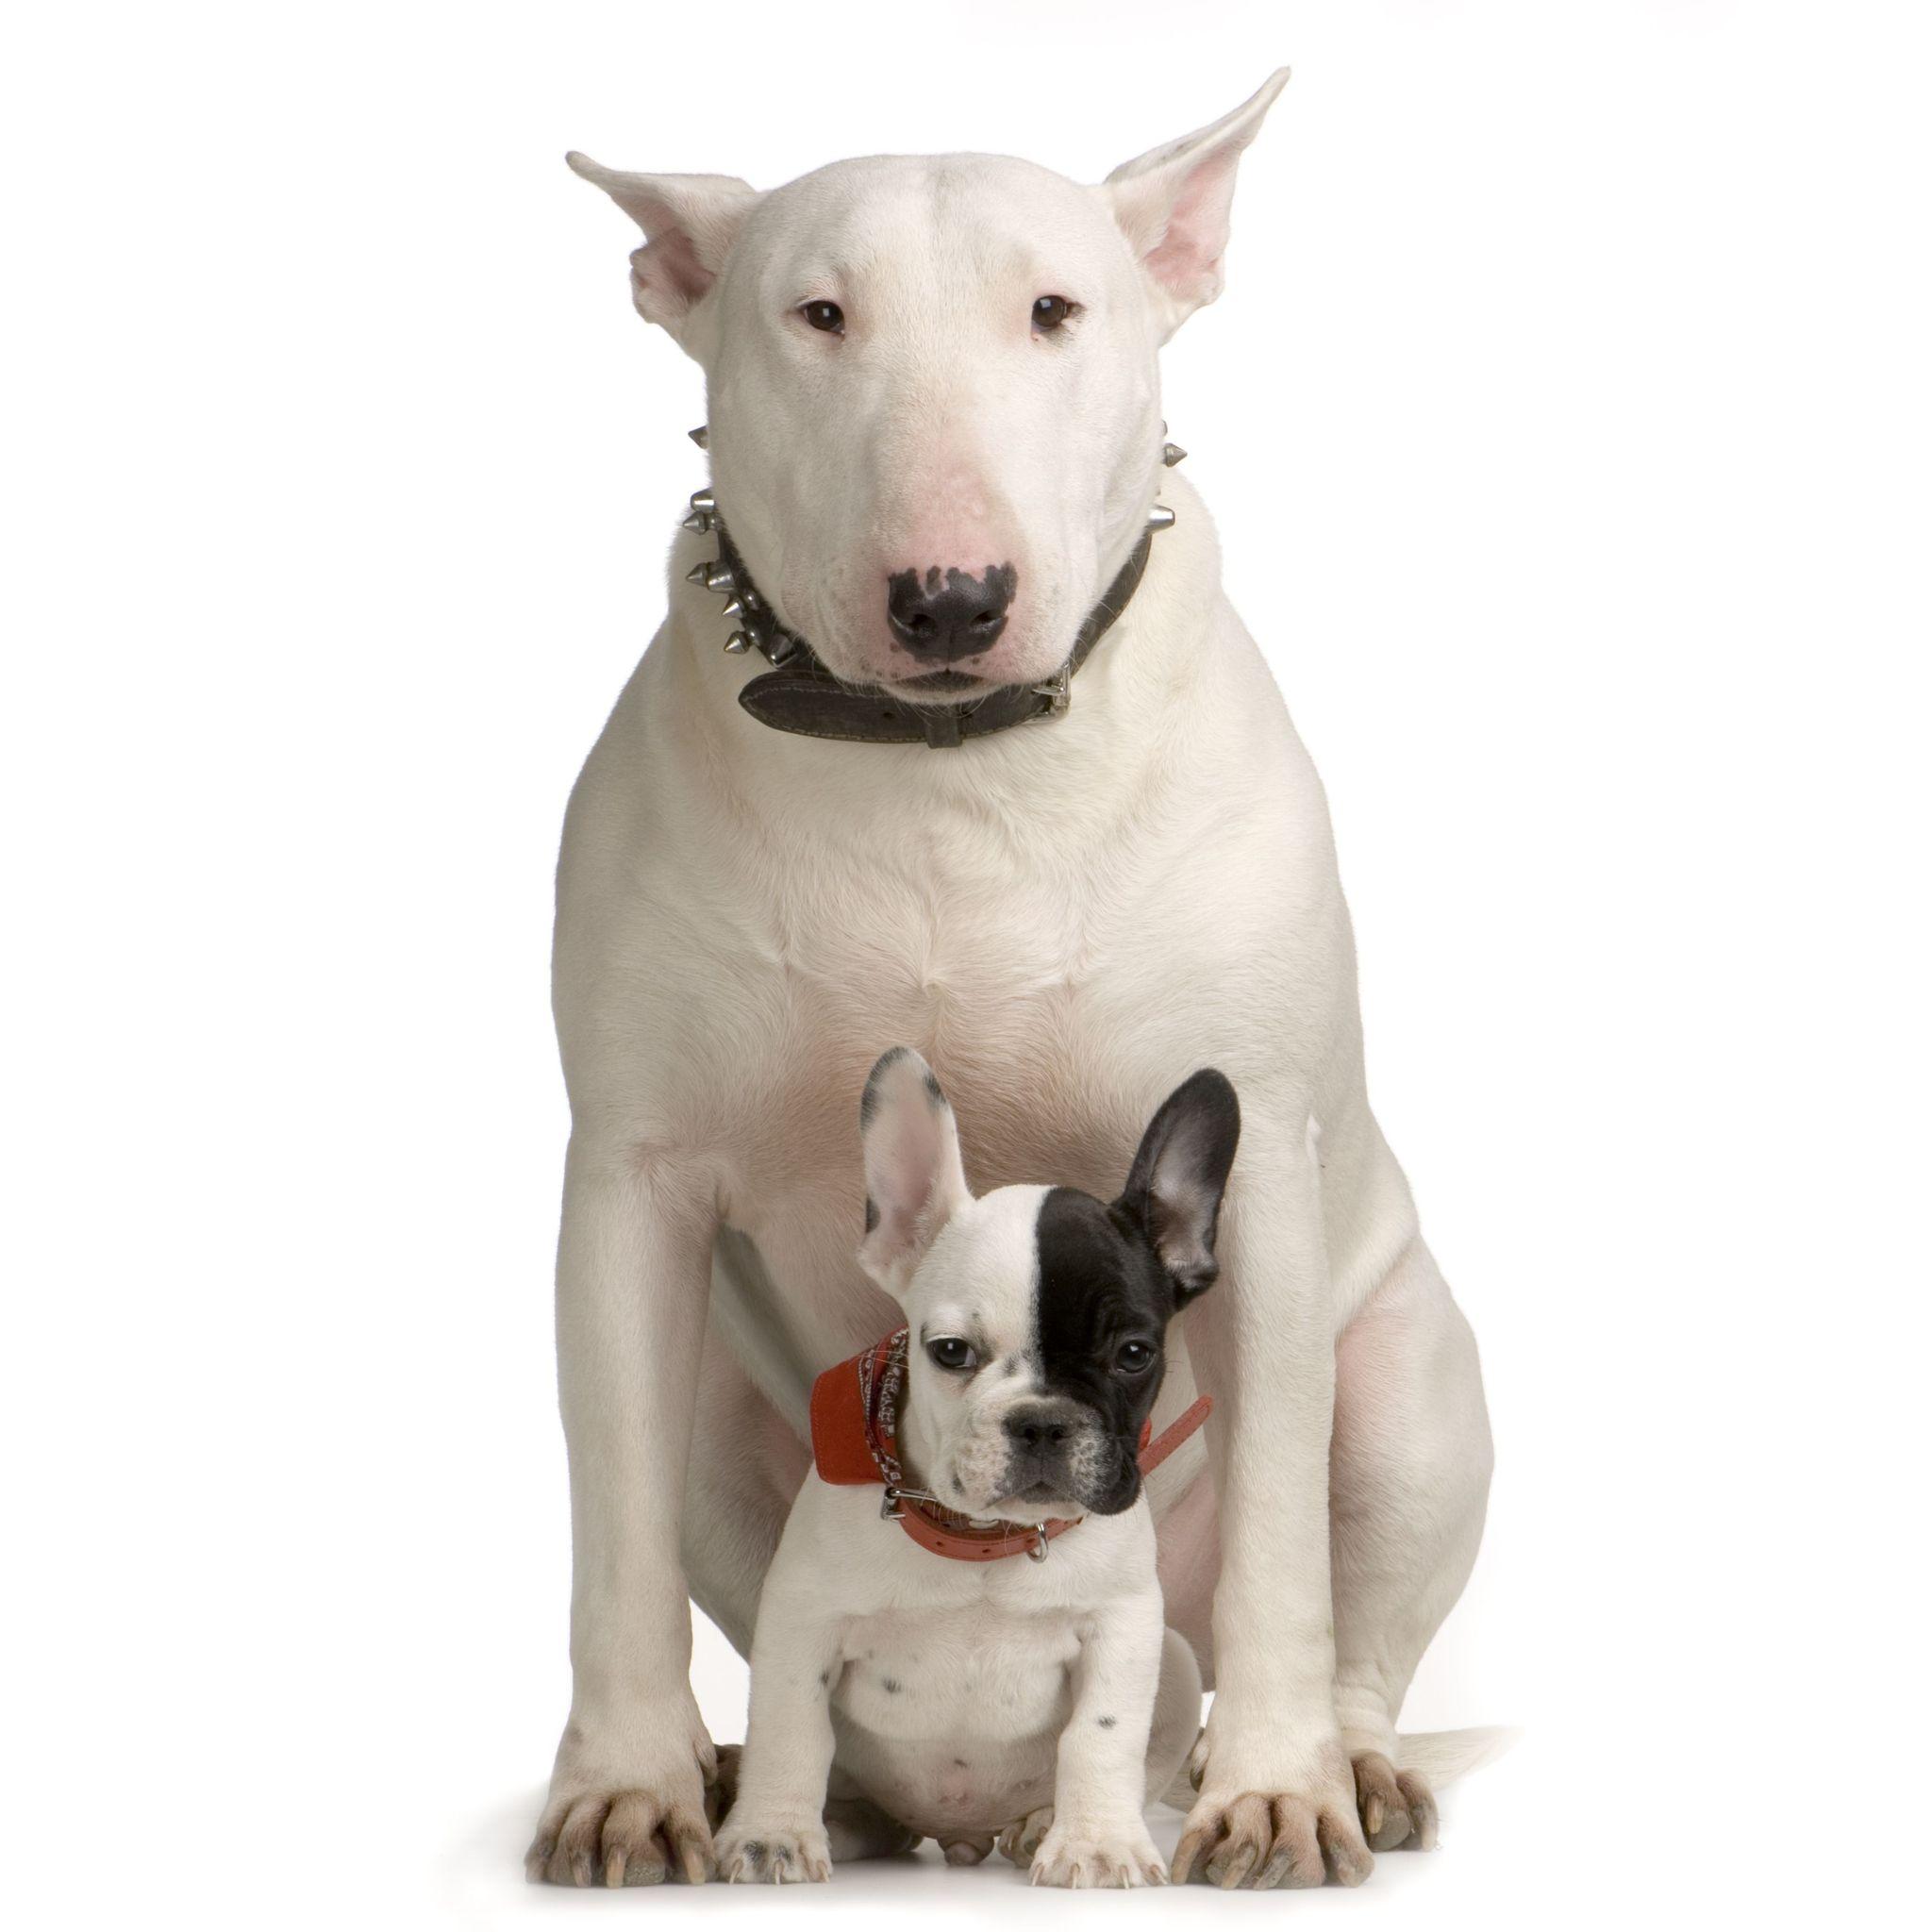 Bull Terrier Wallpapers Animal Hq Bull Terrier Pictures 4k Wallpapers 2019